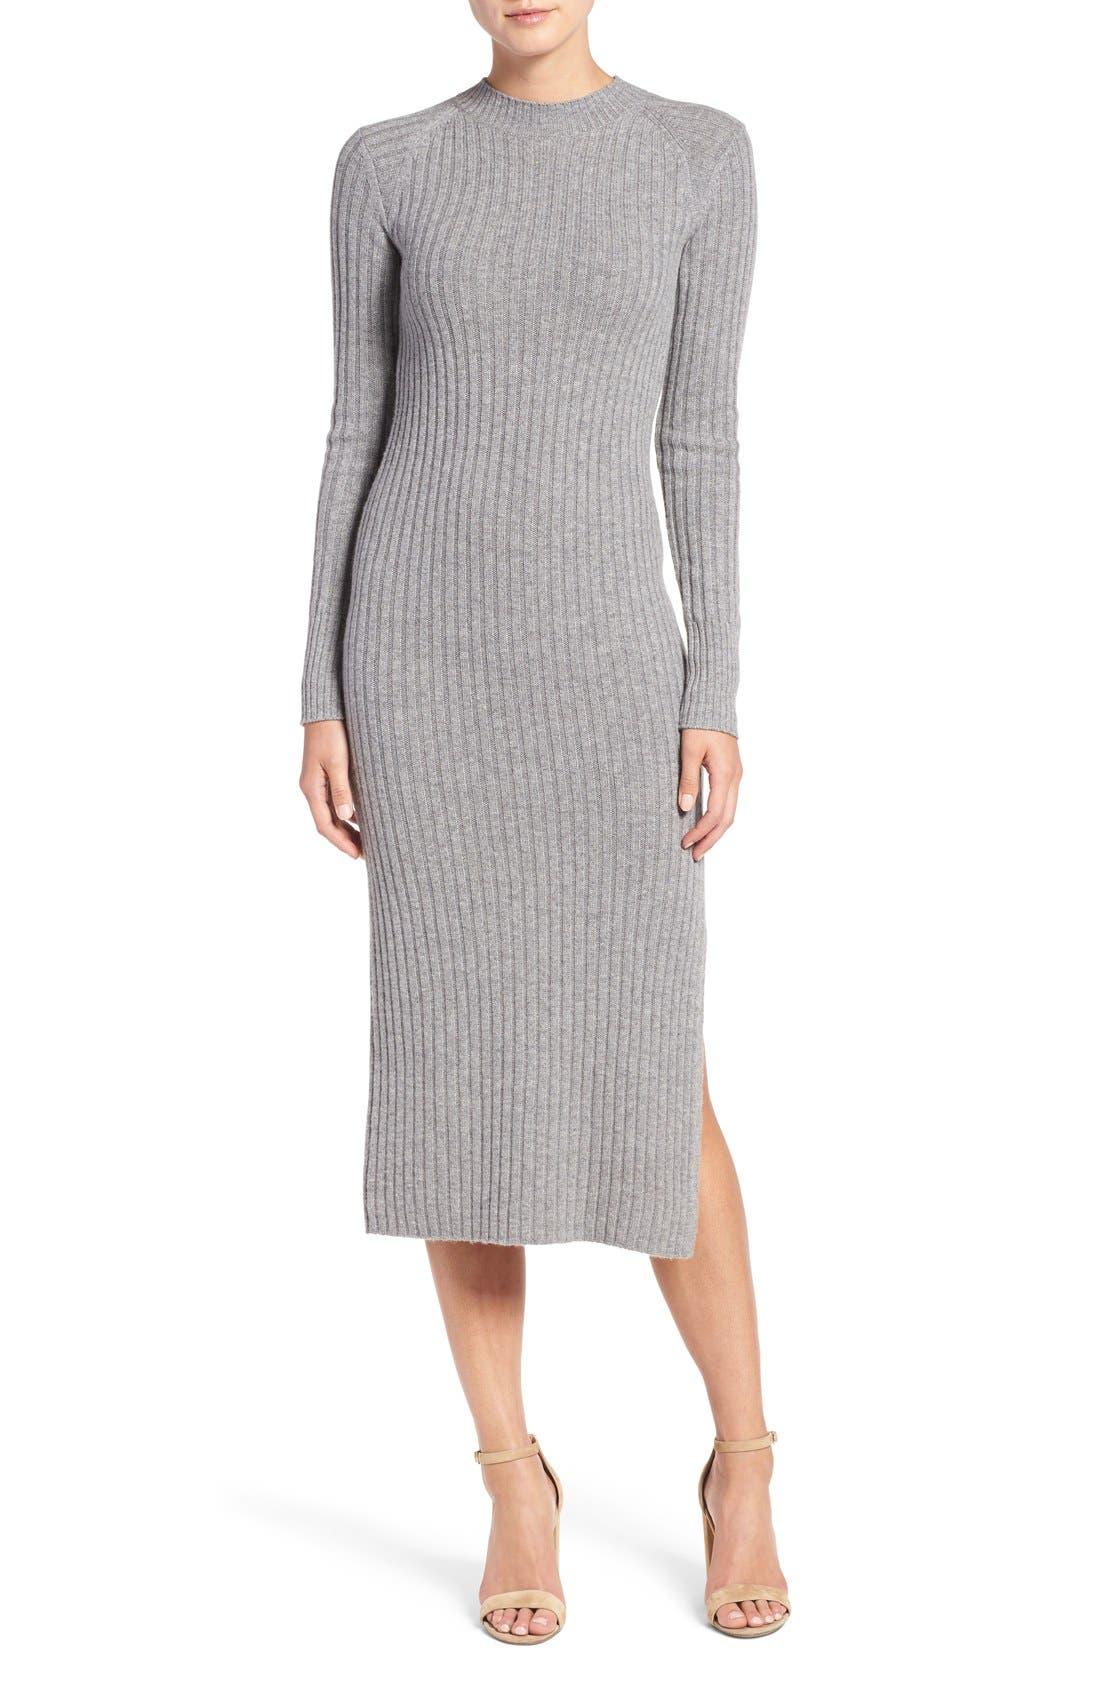 Reign Merino Wool & Cashmere Sweater Midi Dress,                         Main,                         color, Medium Heather Grey